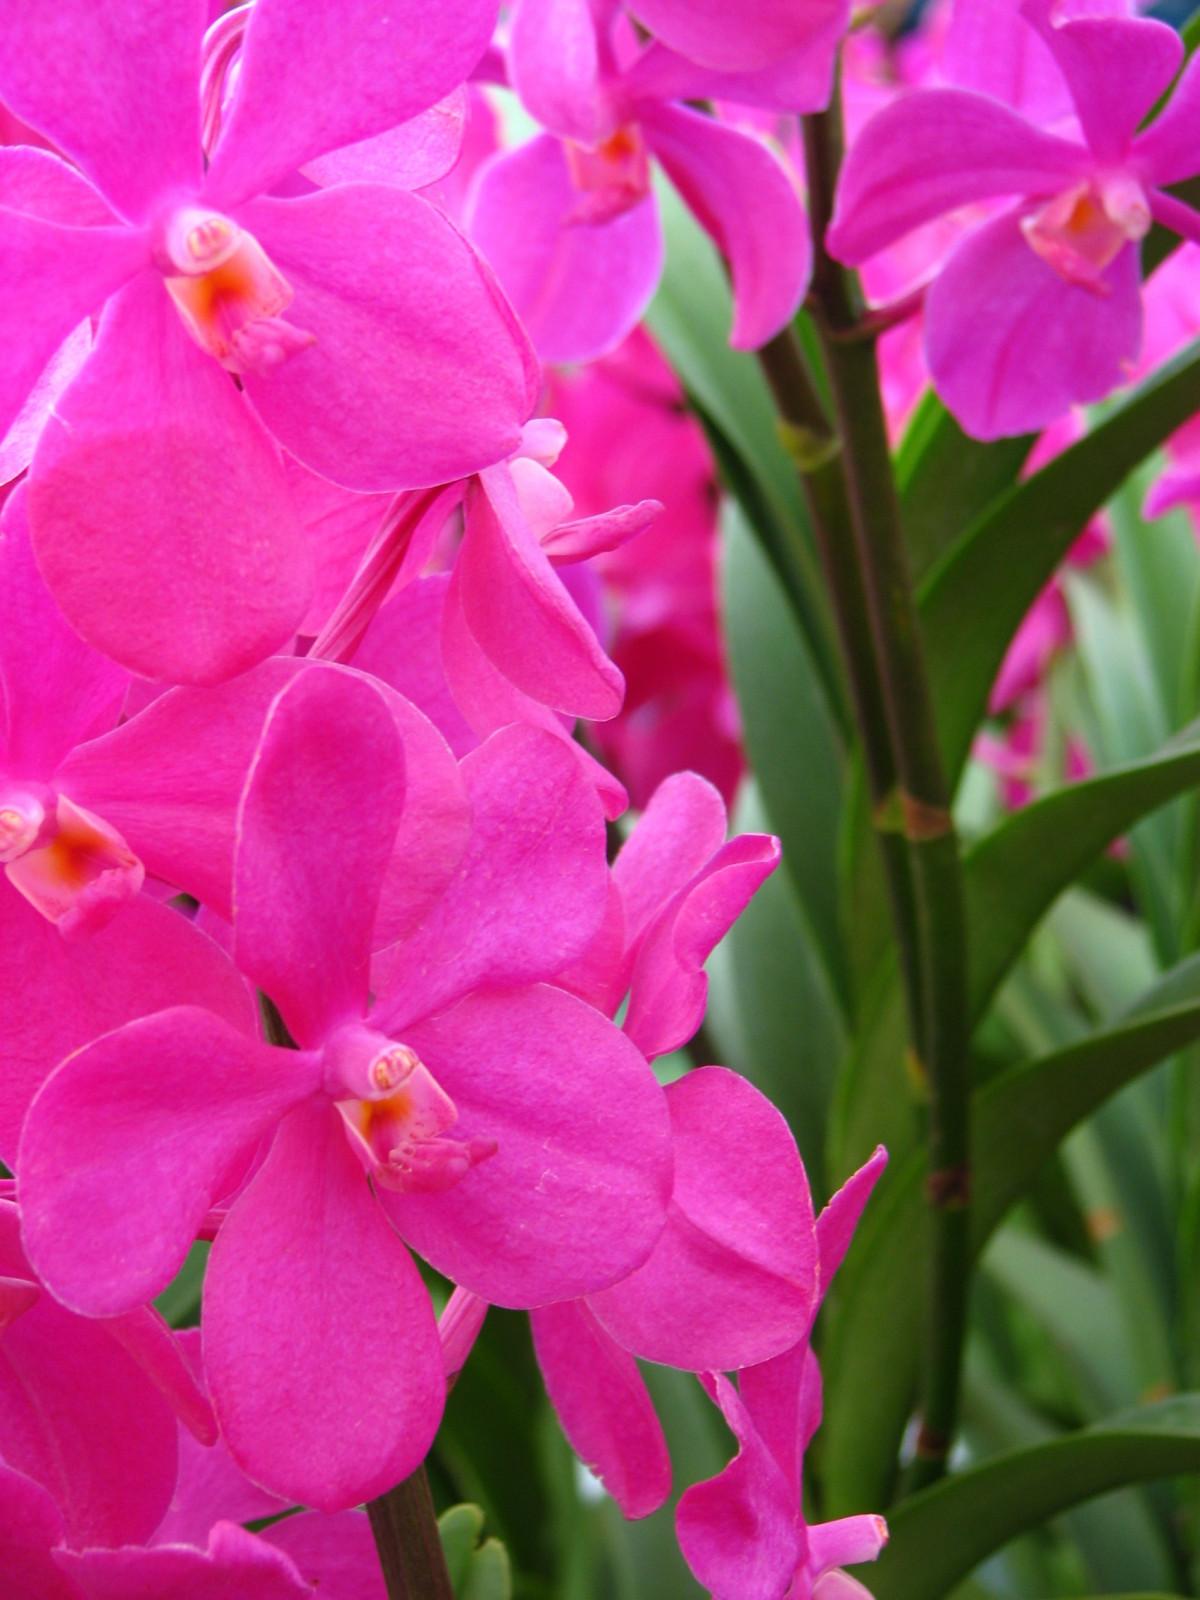 Free Images Flower Petal Botany Pink Flora Orchid Flowers